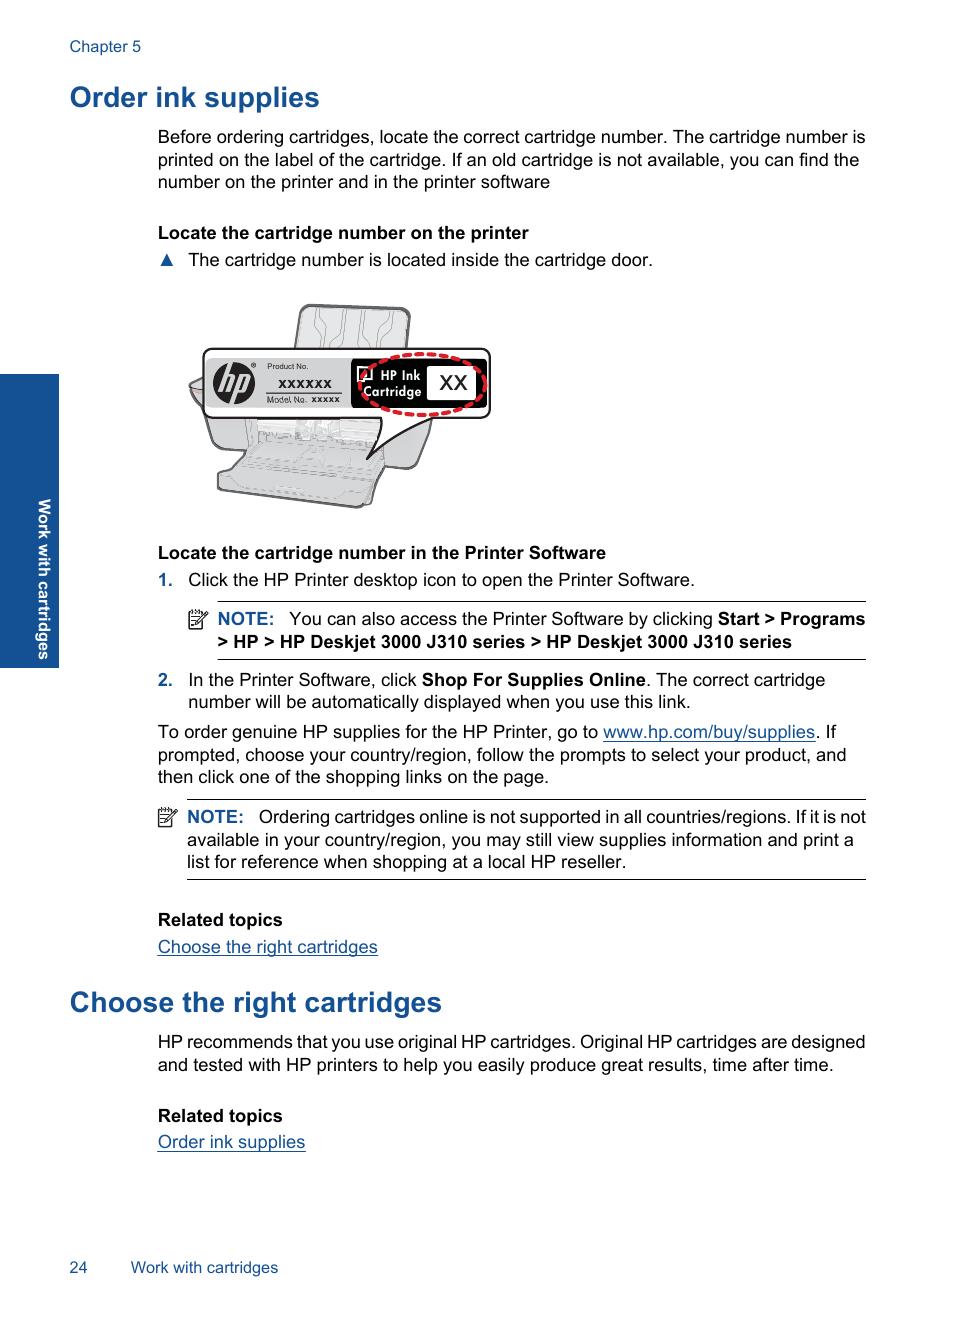 Order ink supplies, Choose the right cartridges | HP Deskjet 3000